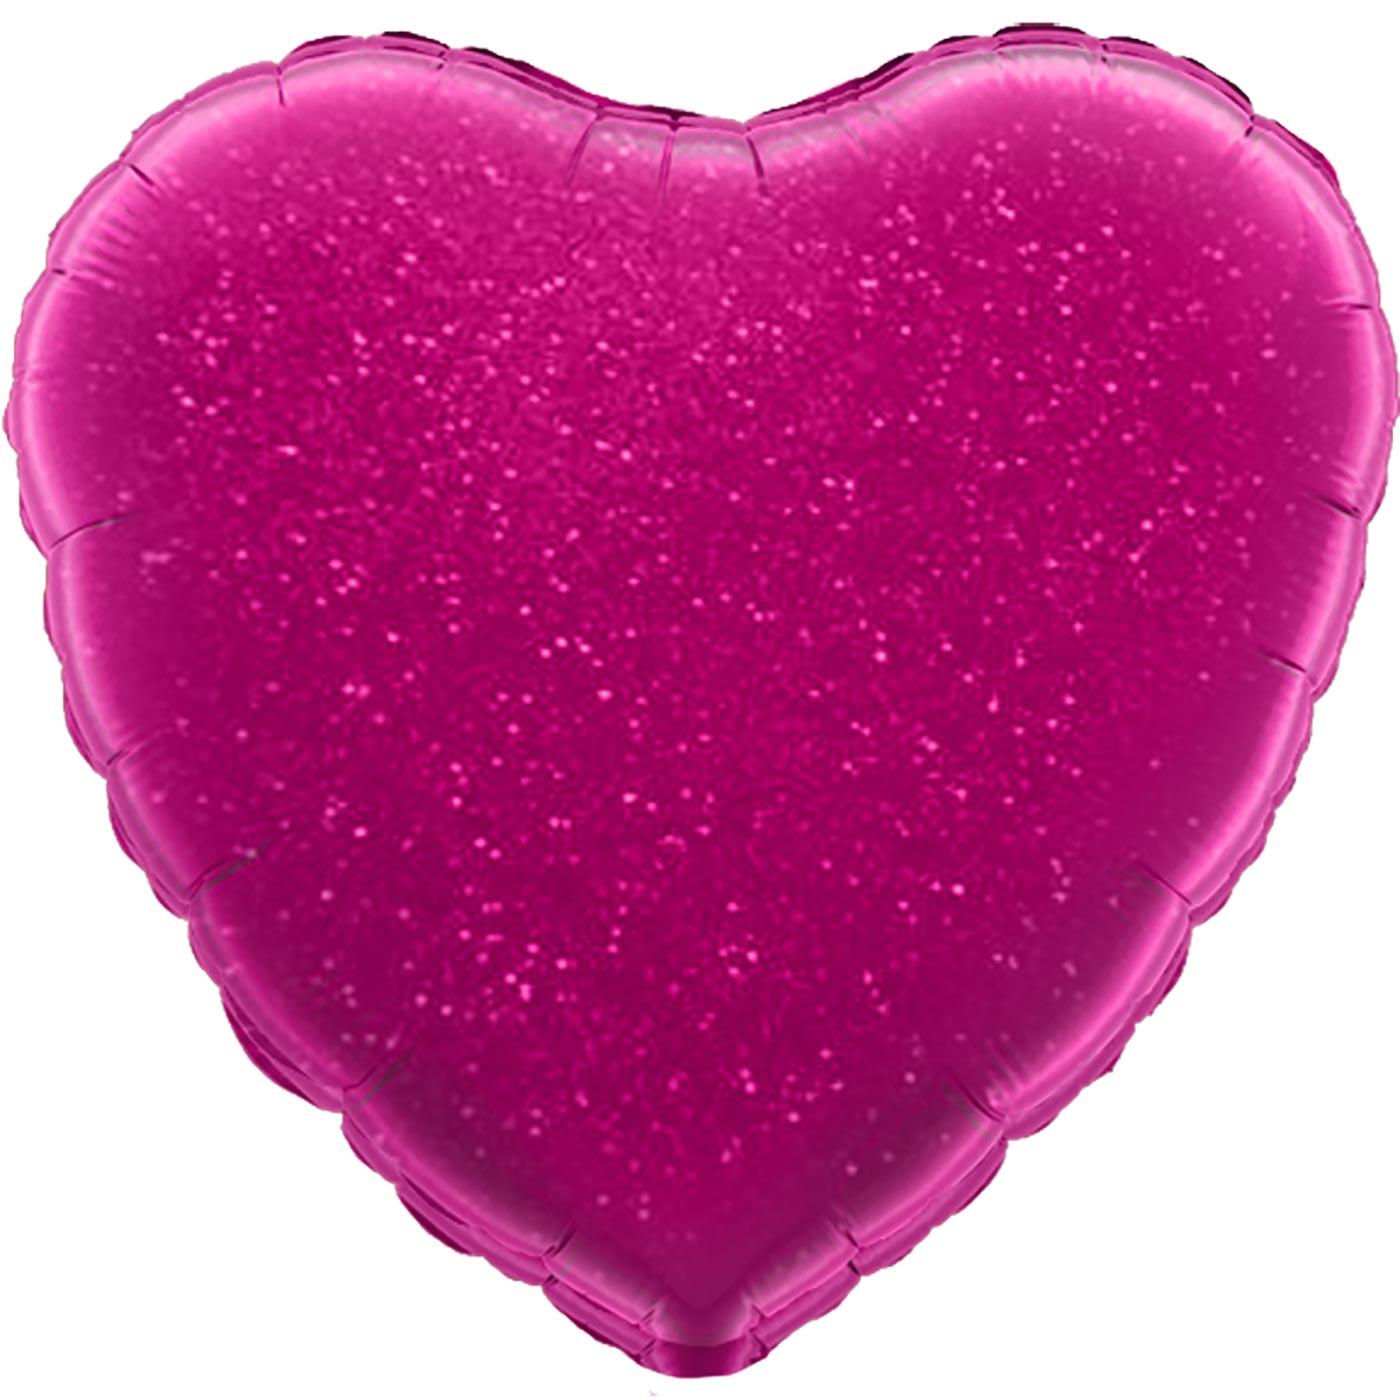 "Oaktree 18"" Fuchsia Holographic Heart"